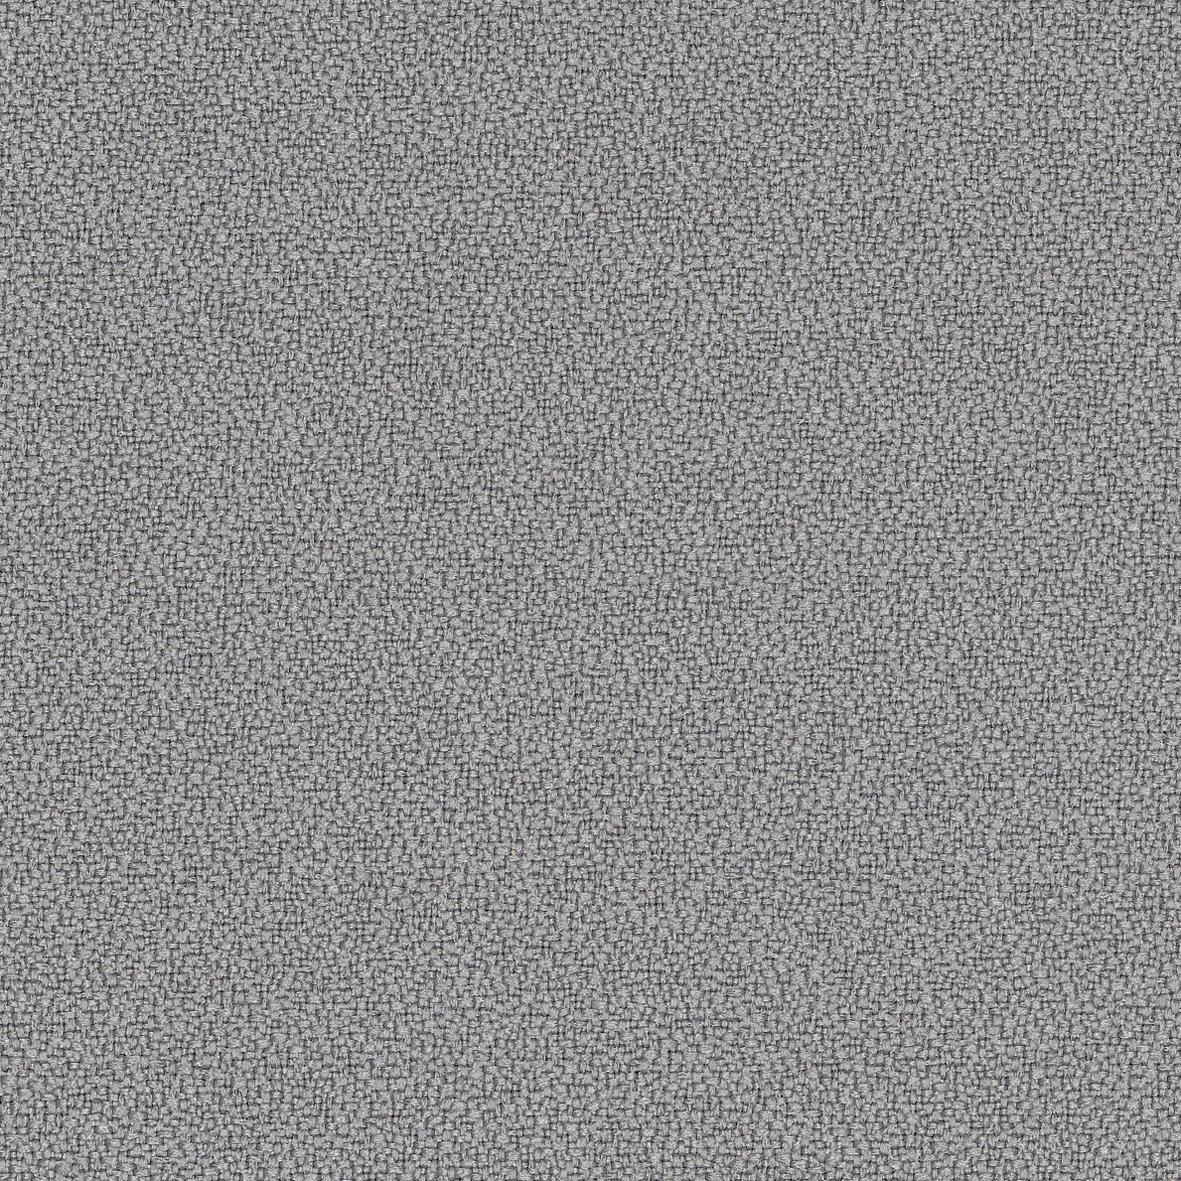 Softline bordskærmvæg grå B600xH590 mm